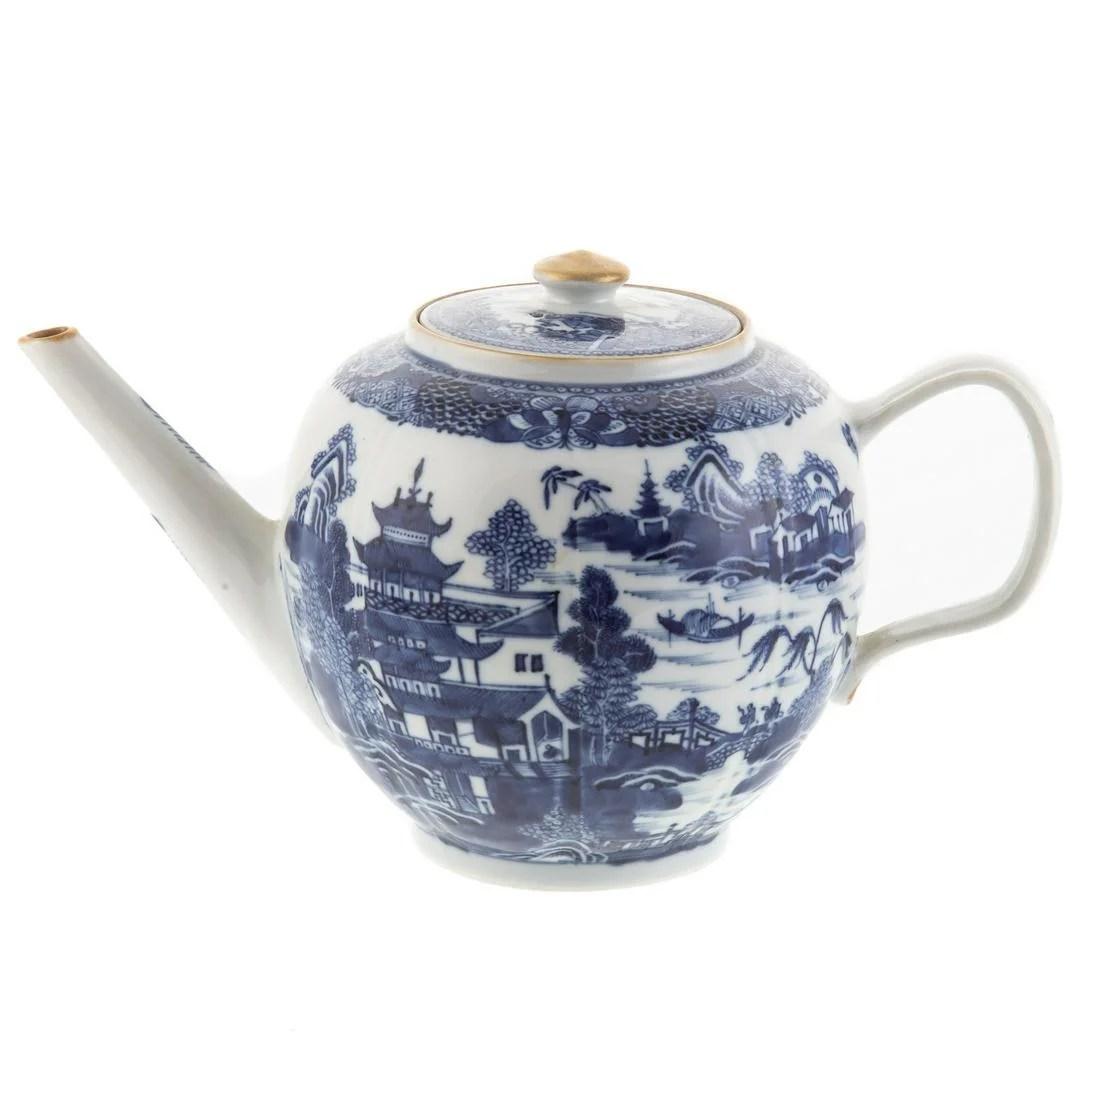 Chinese Export Nanking Globular Teapot